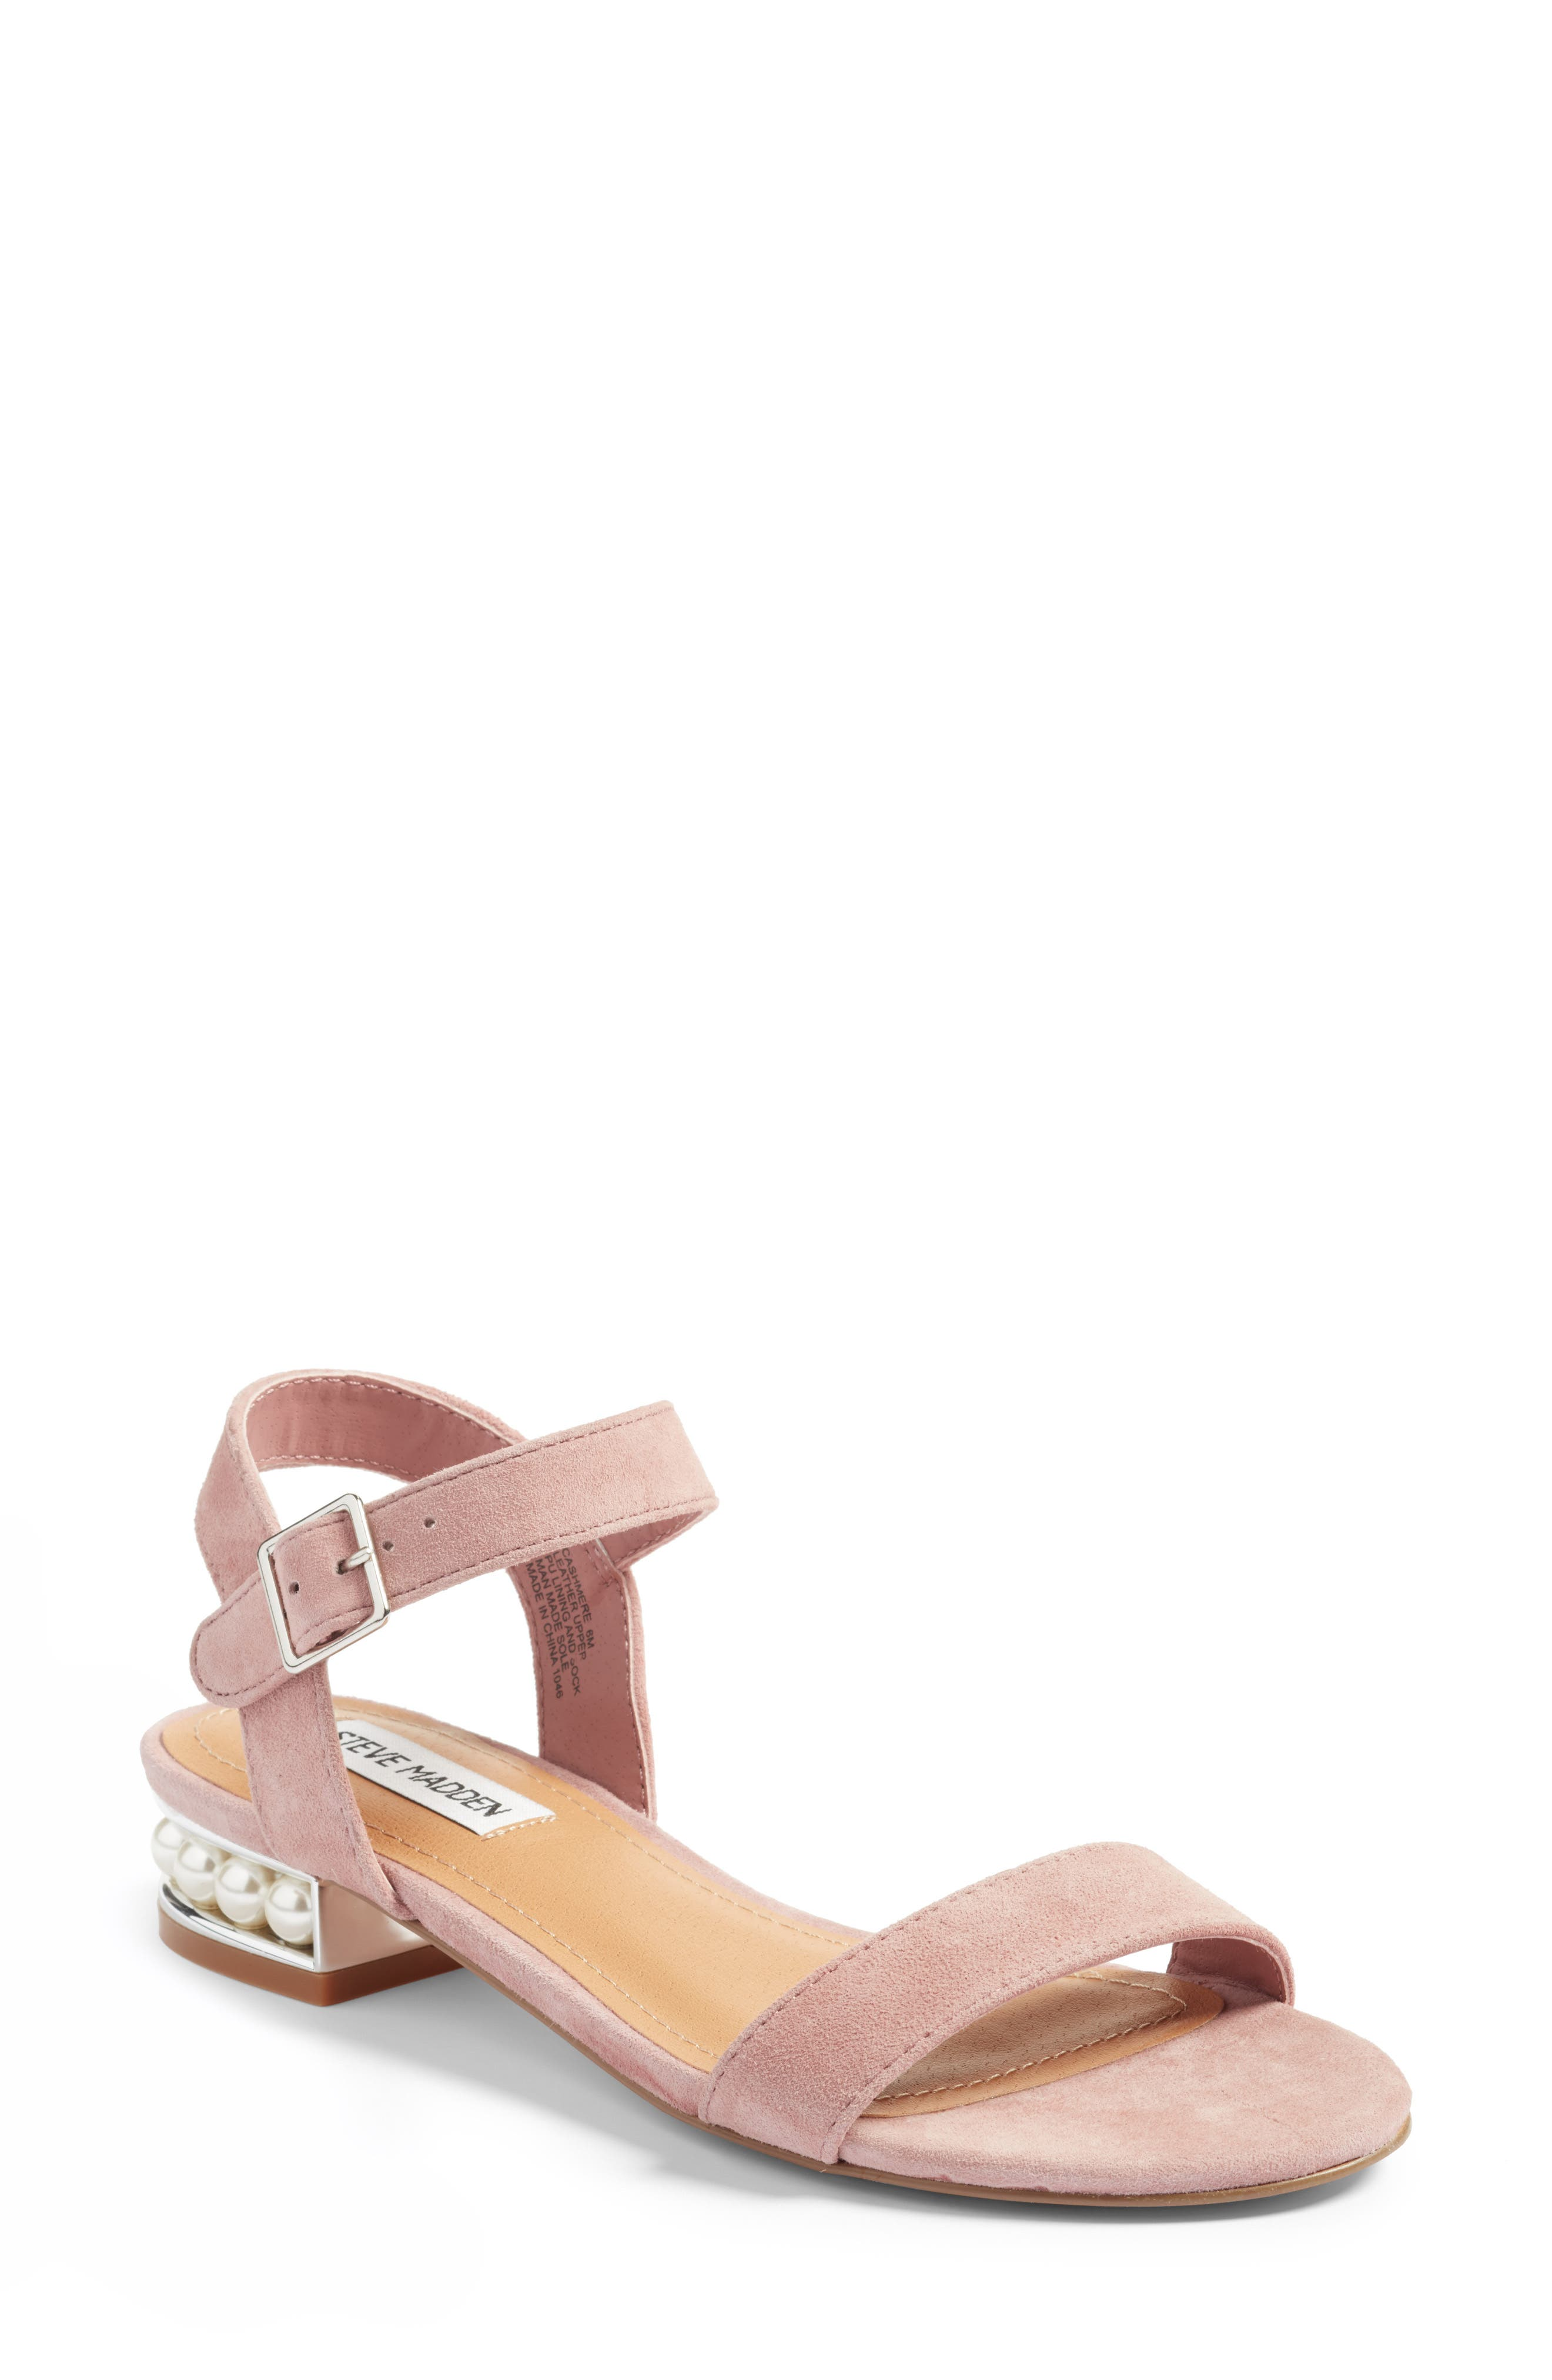 Alternate Image 1 Selected - Steve Madden Embellished Sandal (Women)